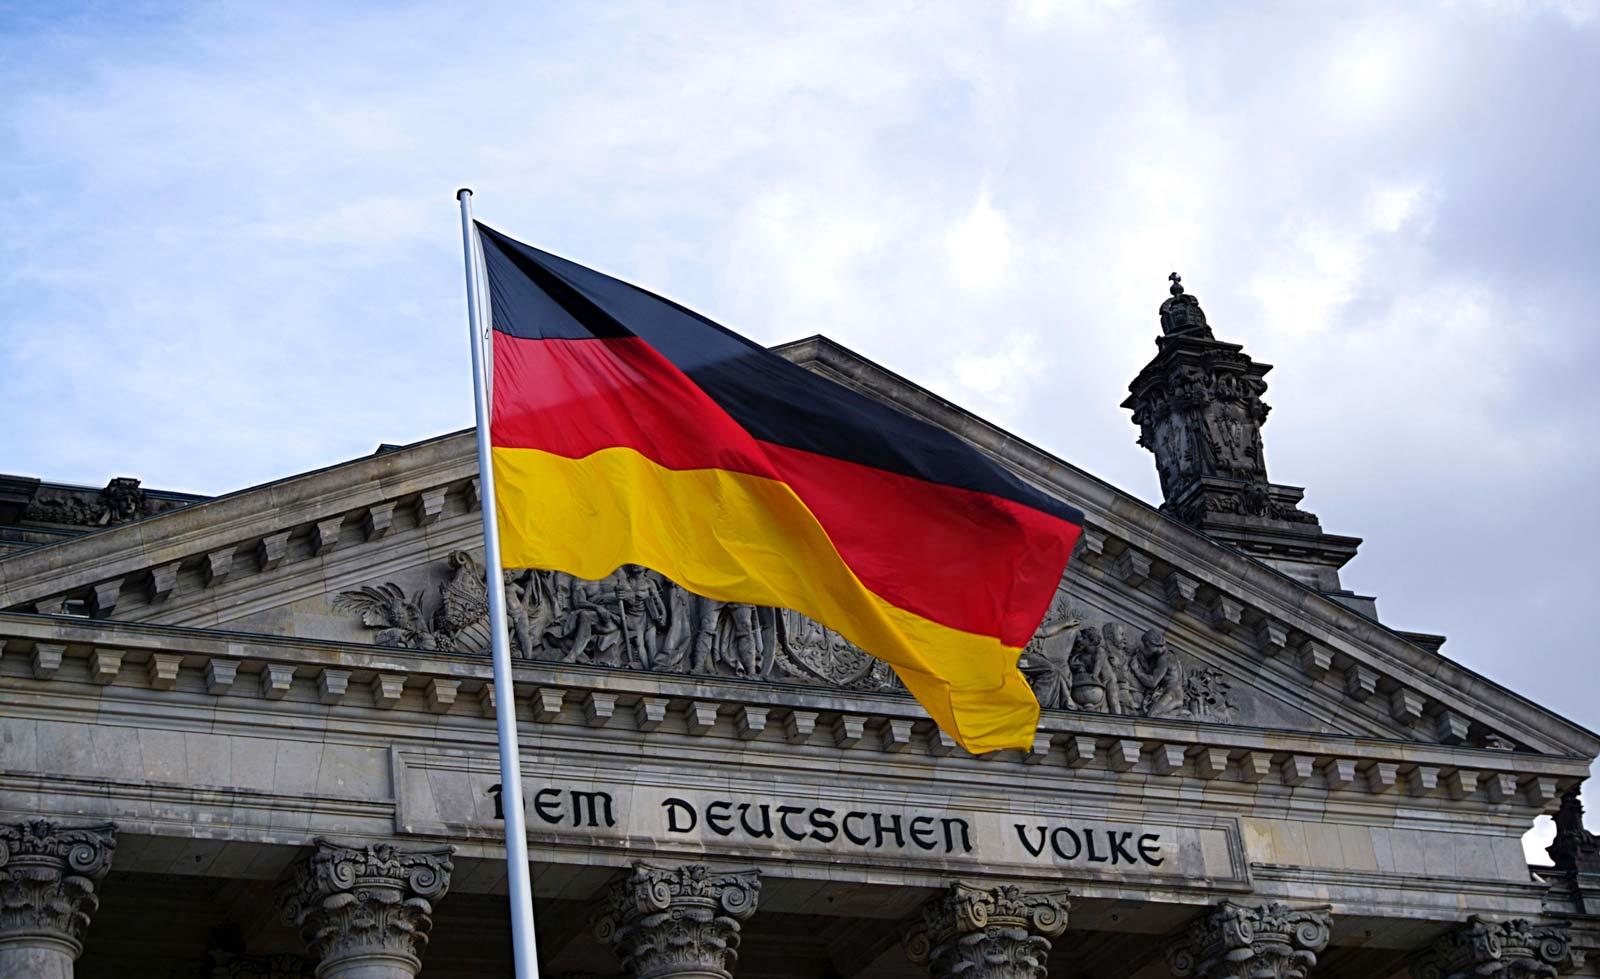 Duitse-tradities lederhosen